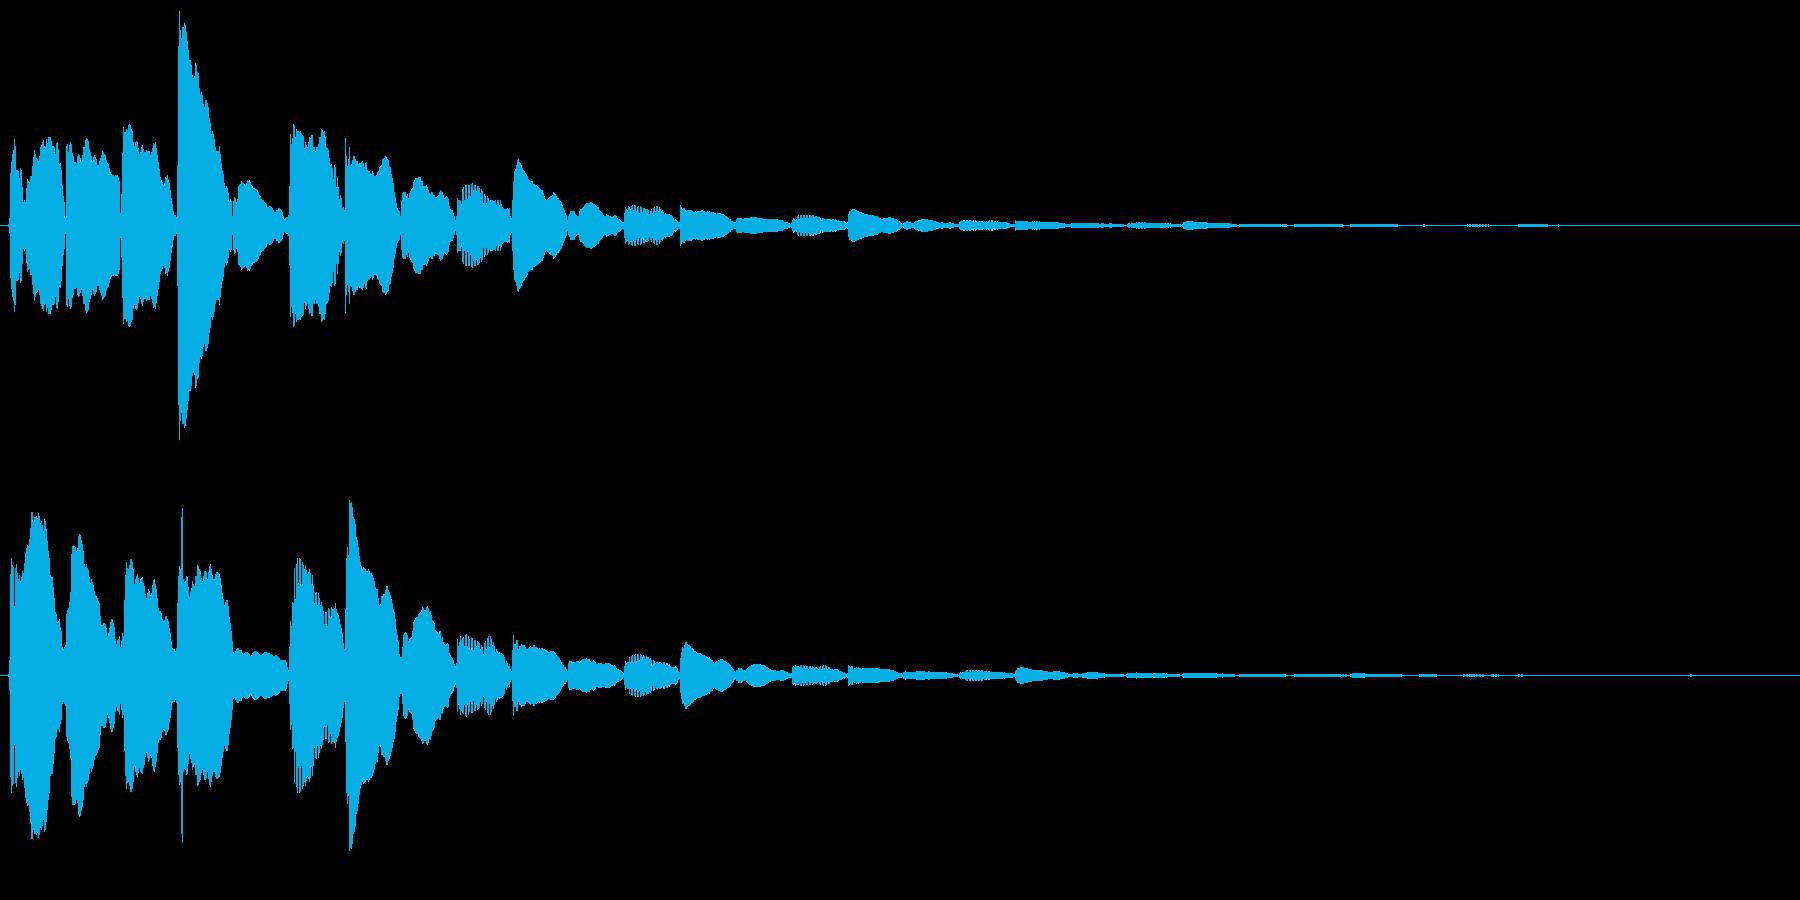 test2の再生済みの波形